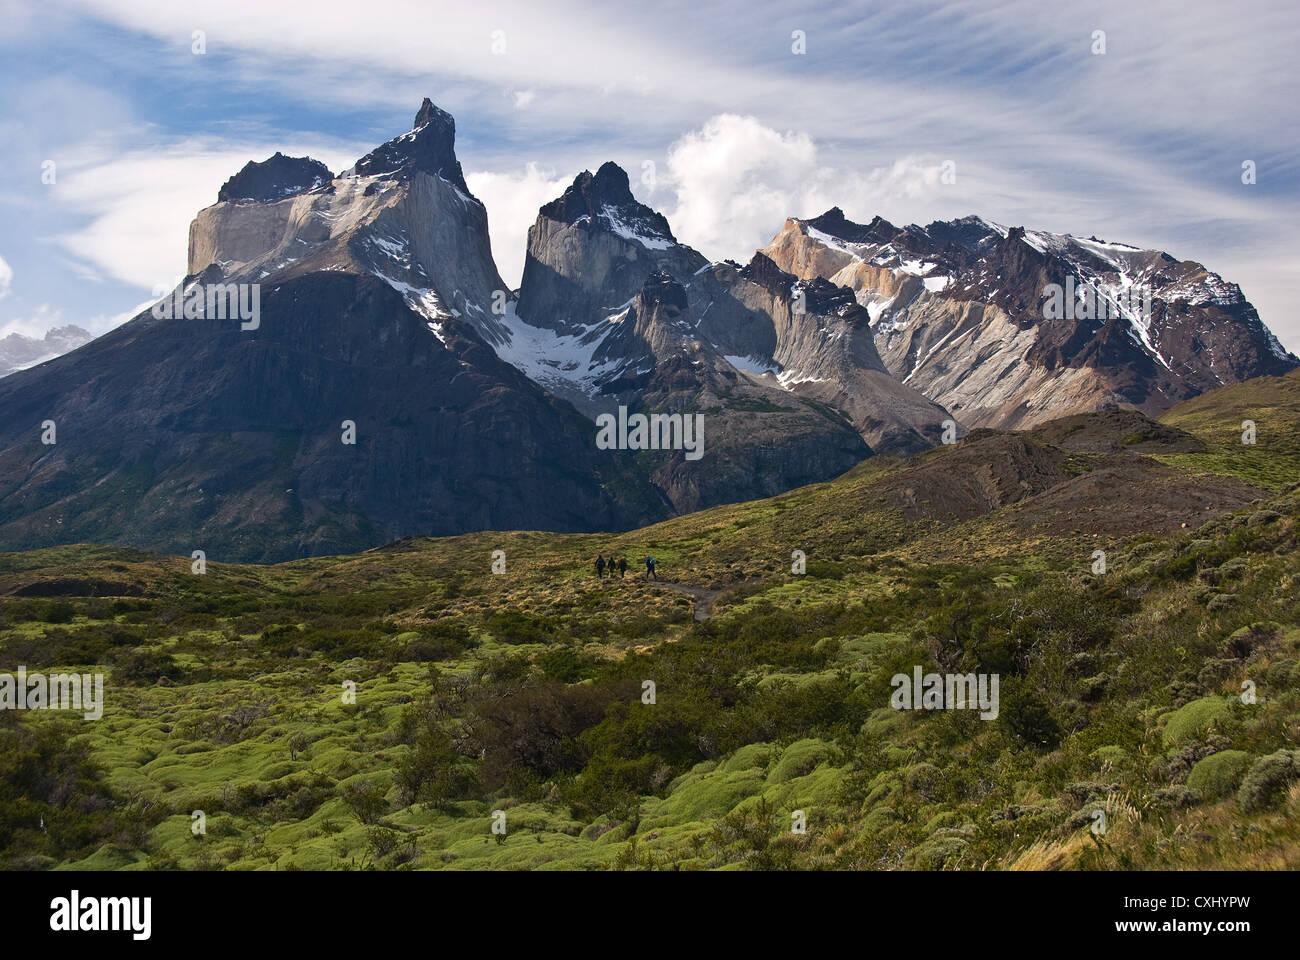 Elk198-4478 Chile, Torres del Paine National Park, Cuernos massif, hikers on trail near Lago Nordenskjold - Stock Image